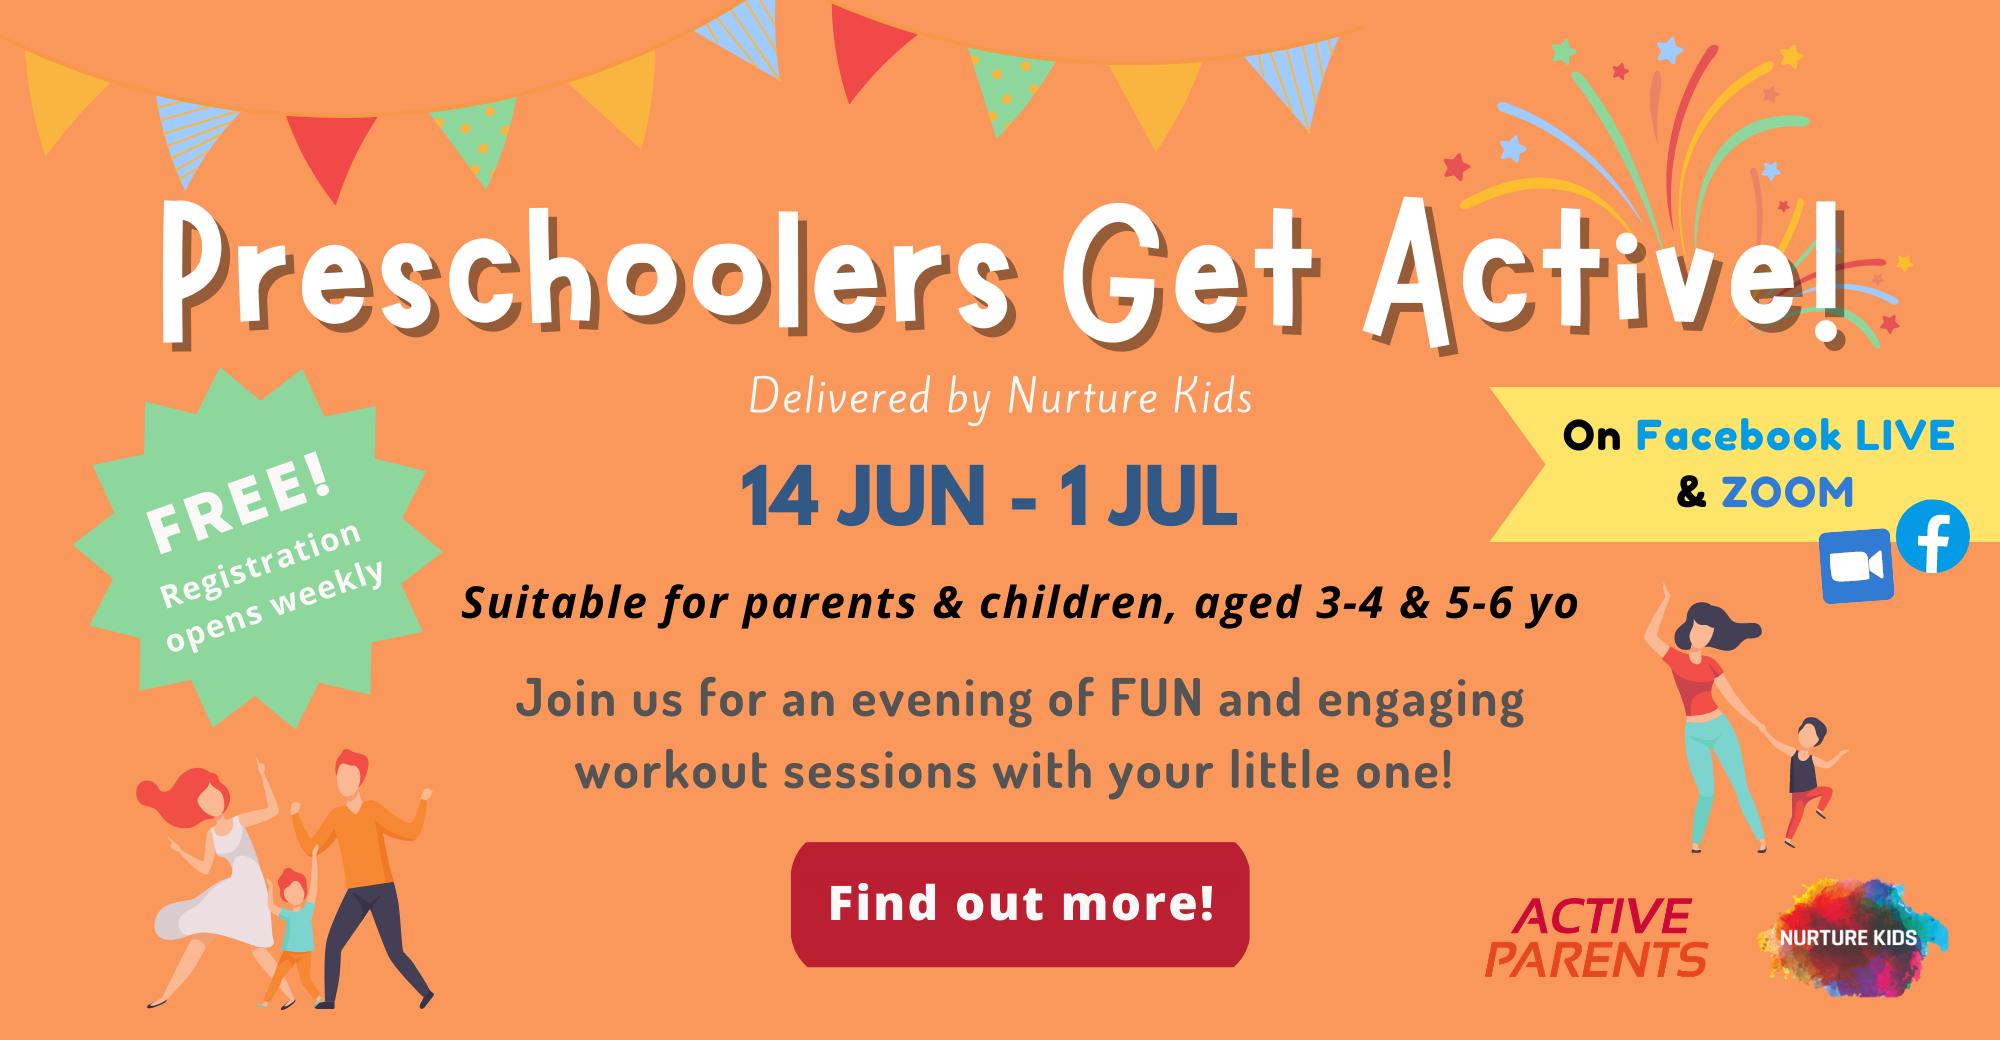 Preschoolers Get Active! - Campaign Page Banner